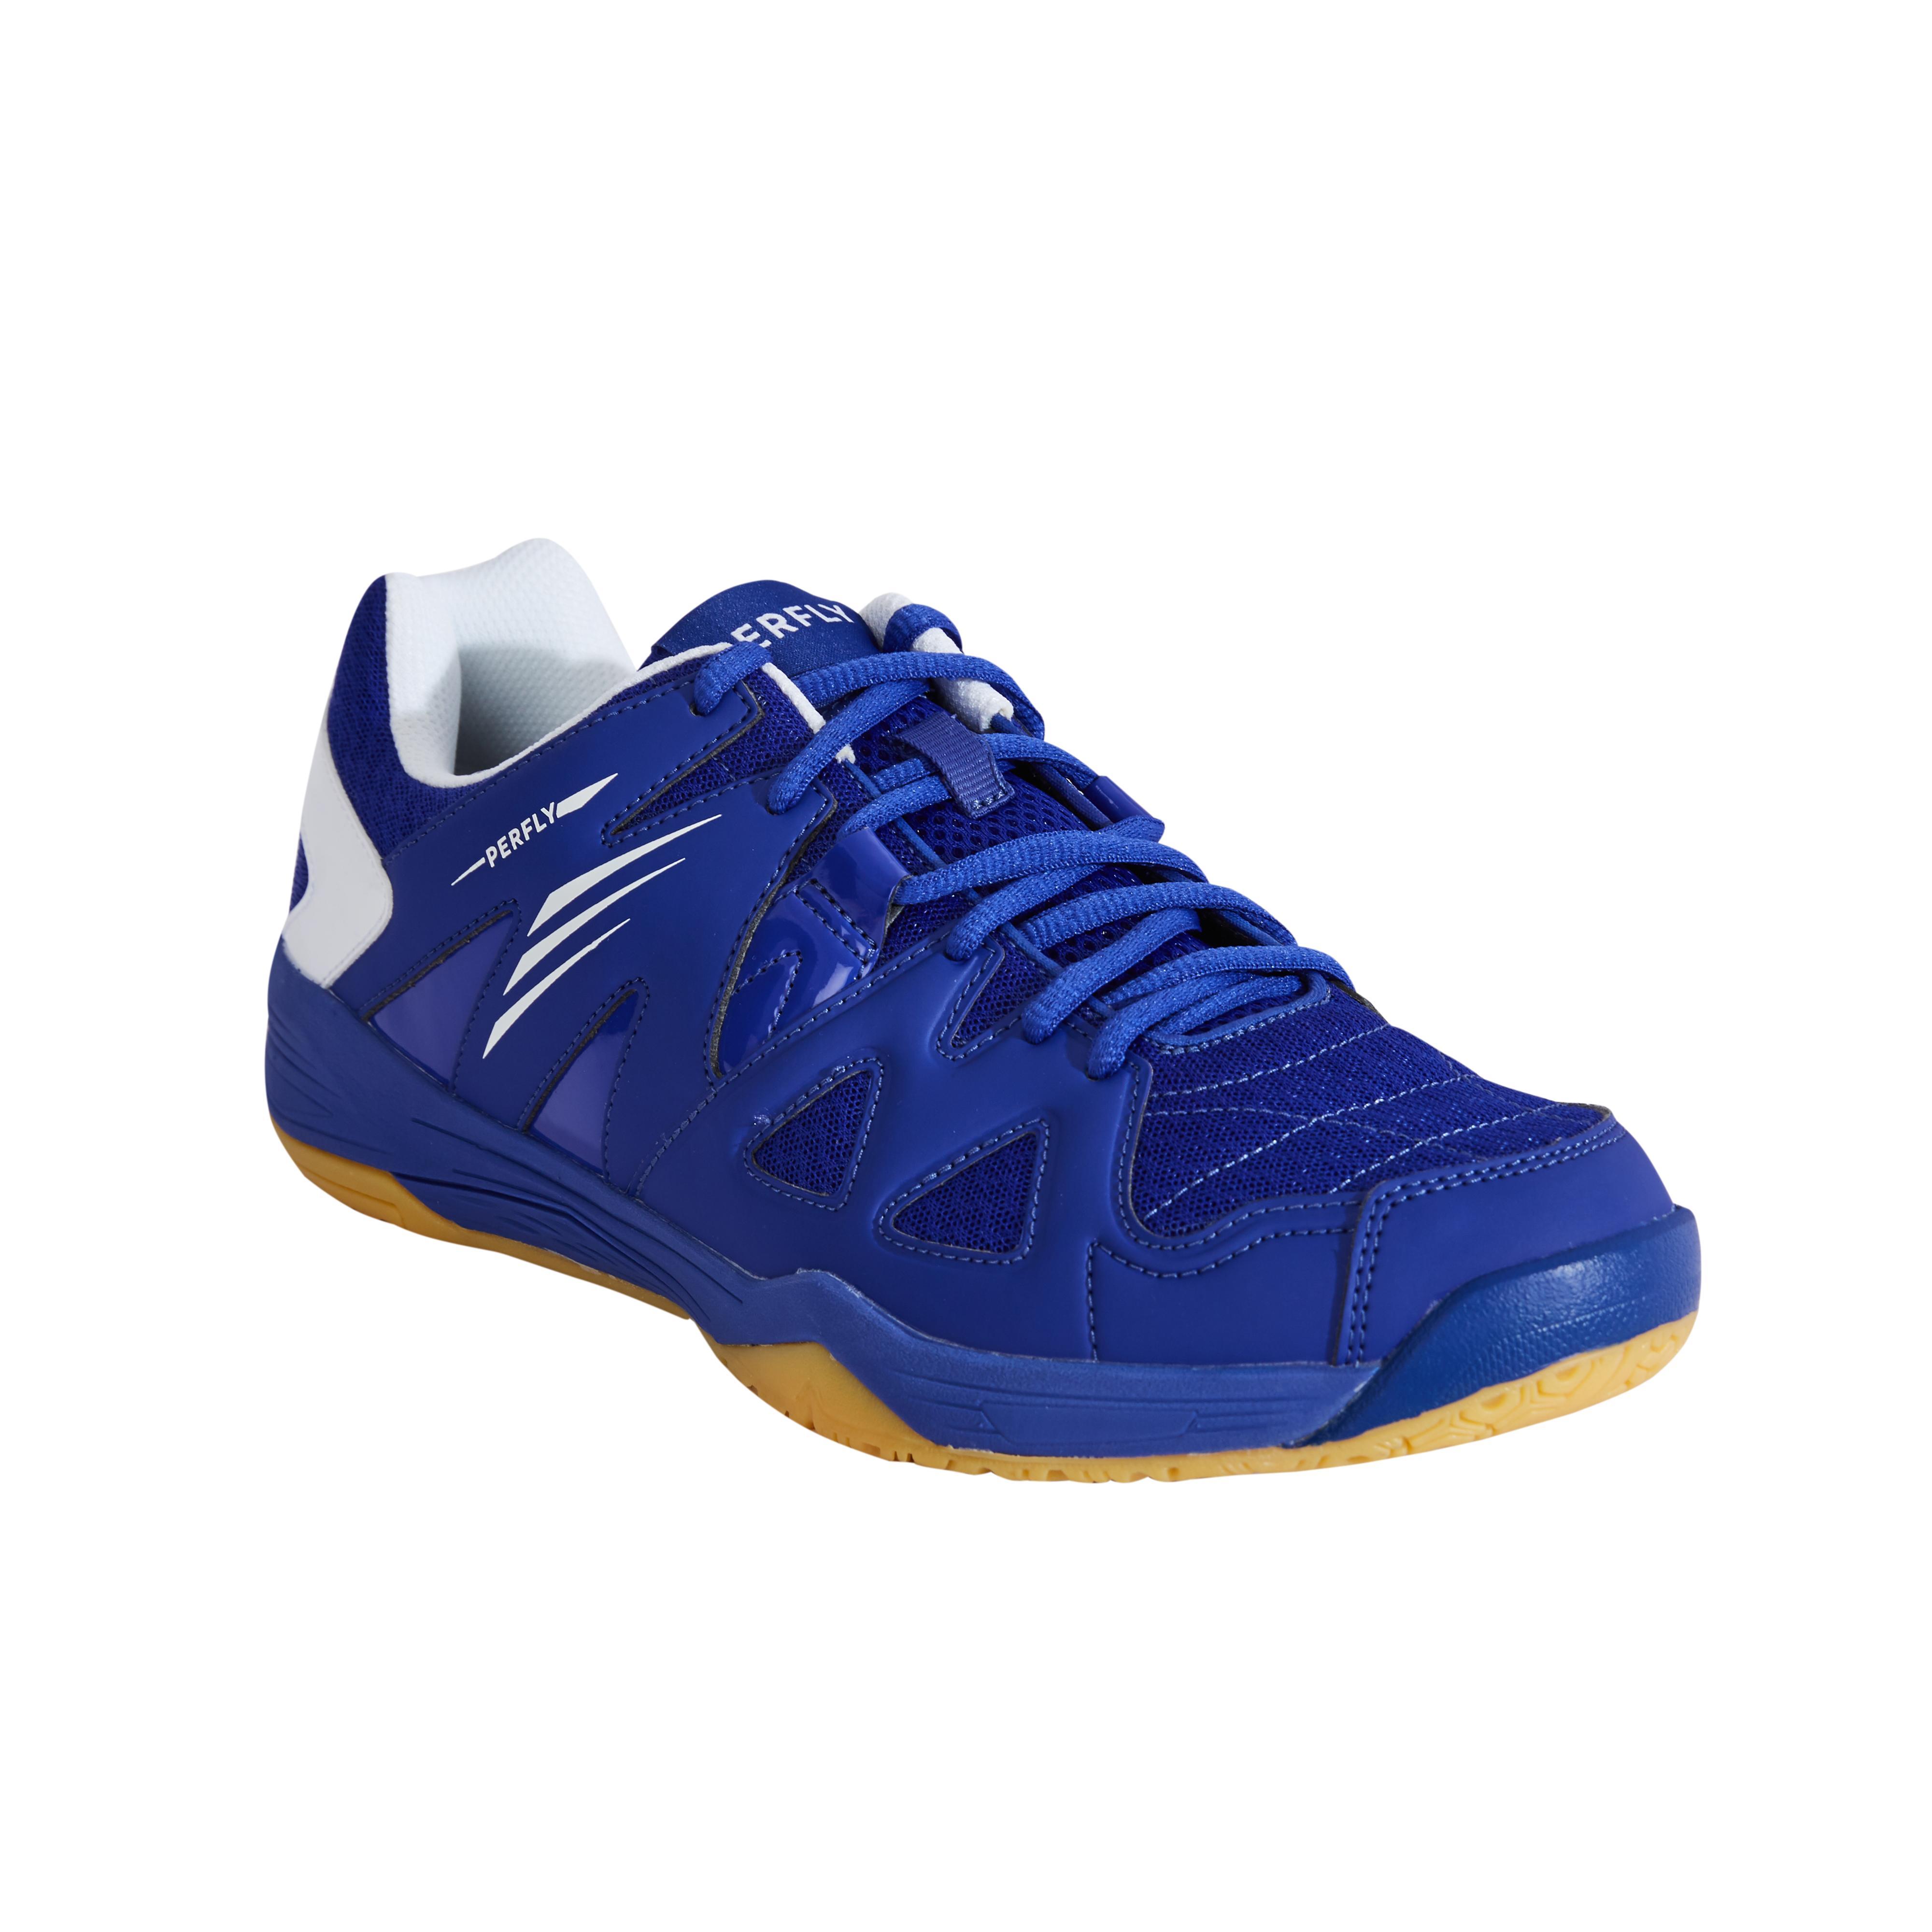 PERFLY Chaussures De Badminton pour Homme BS530 - Bleu - PERFLY - 45